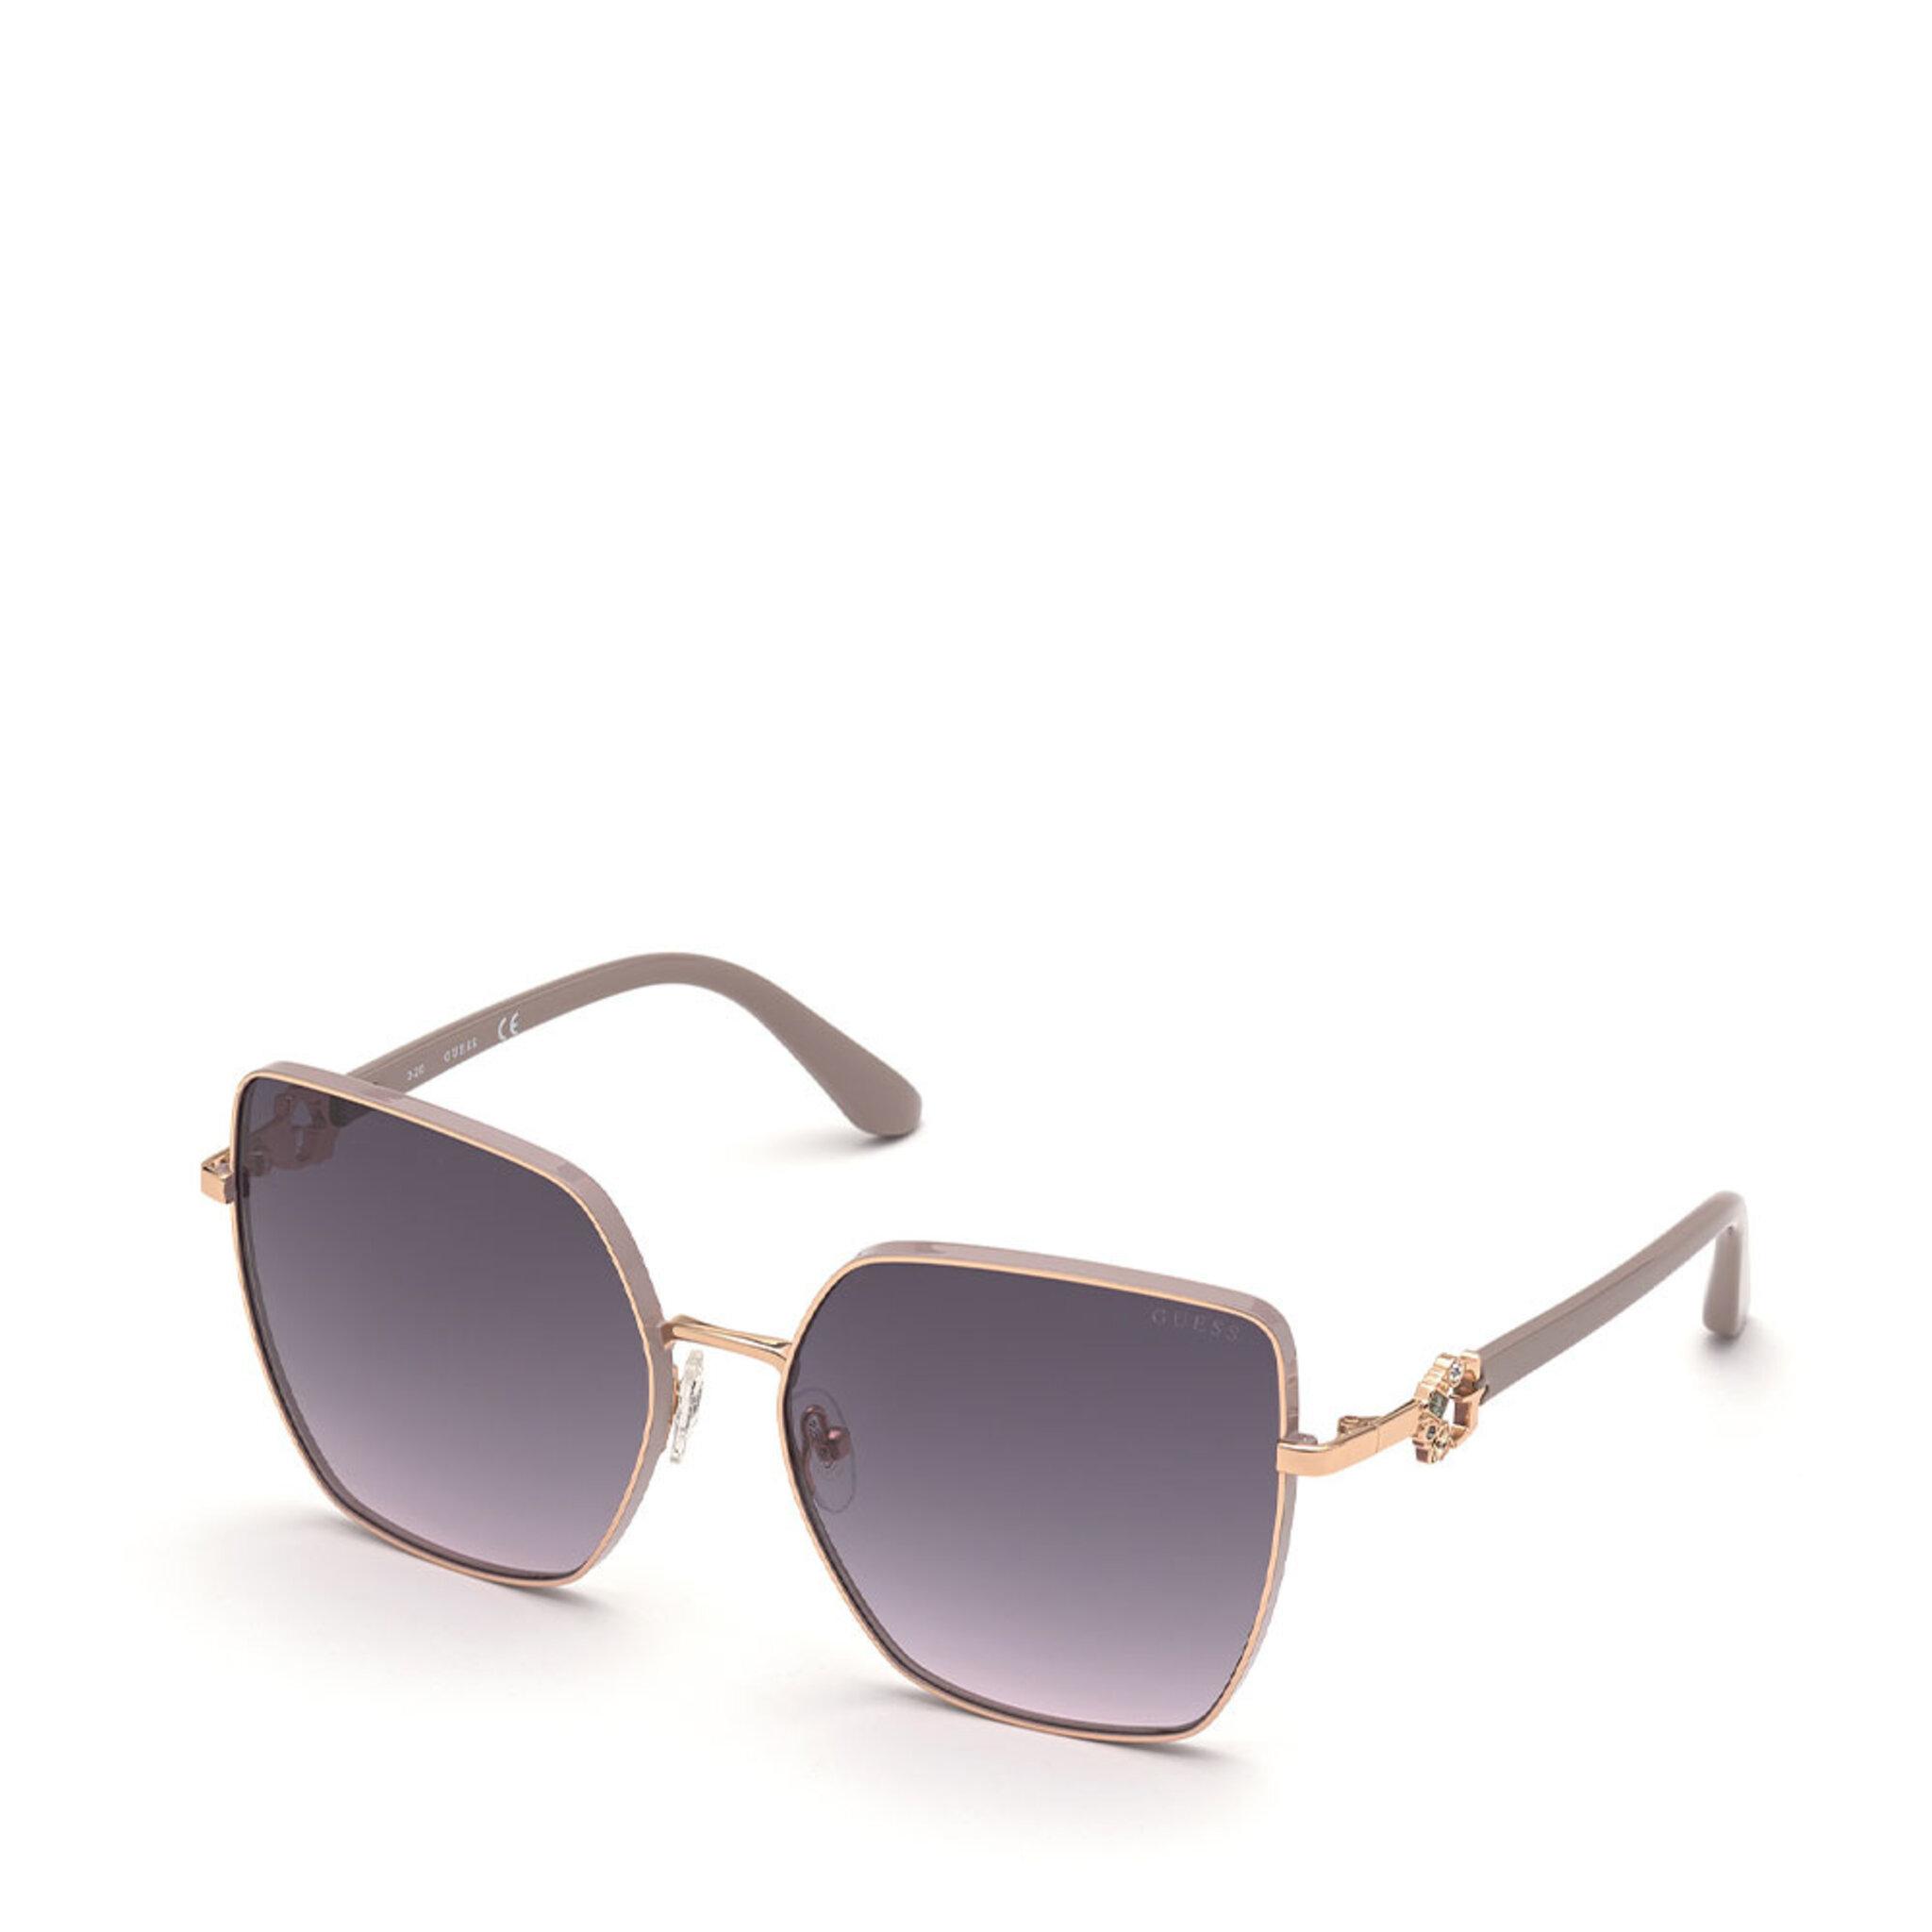 Sunglasses GU7790-S